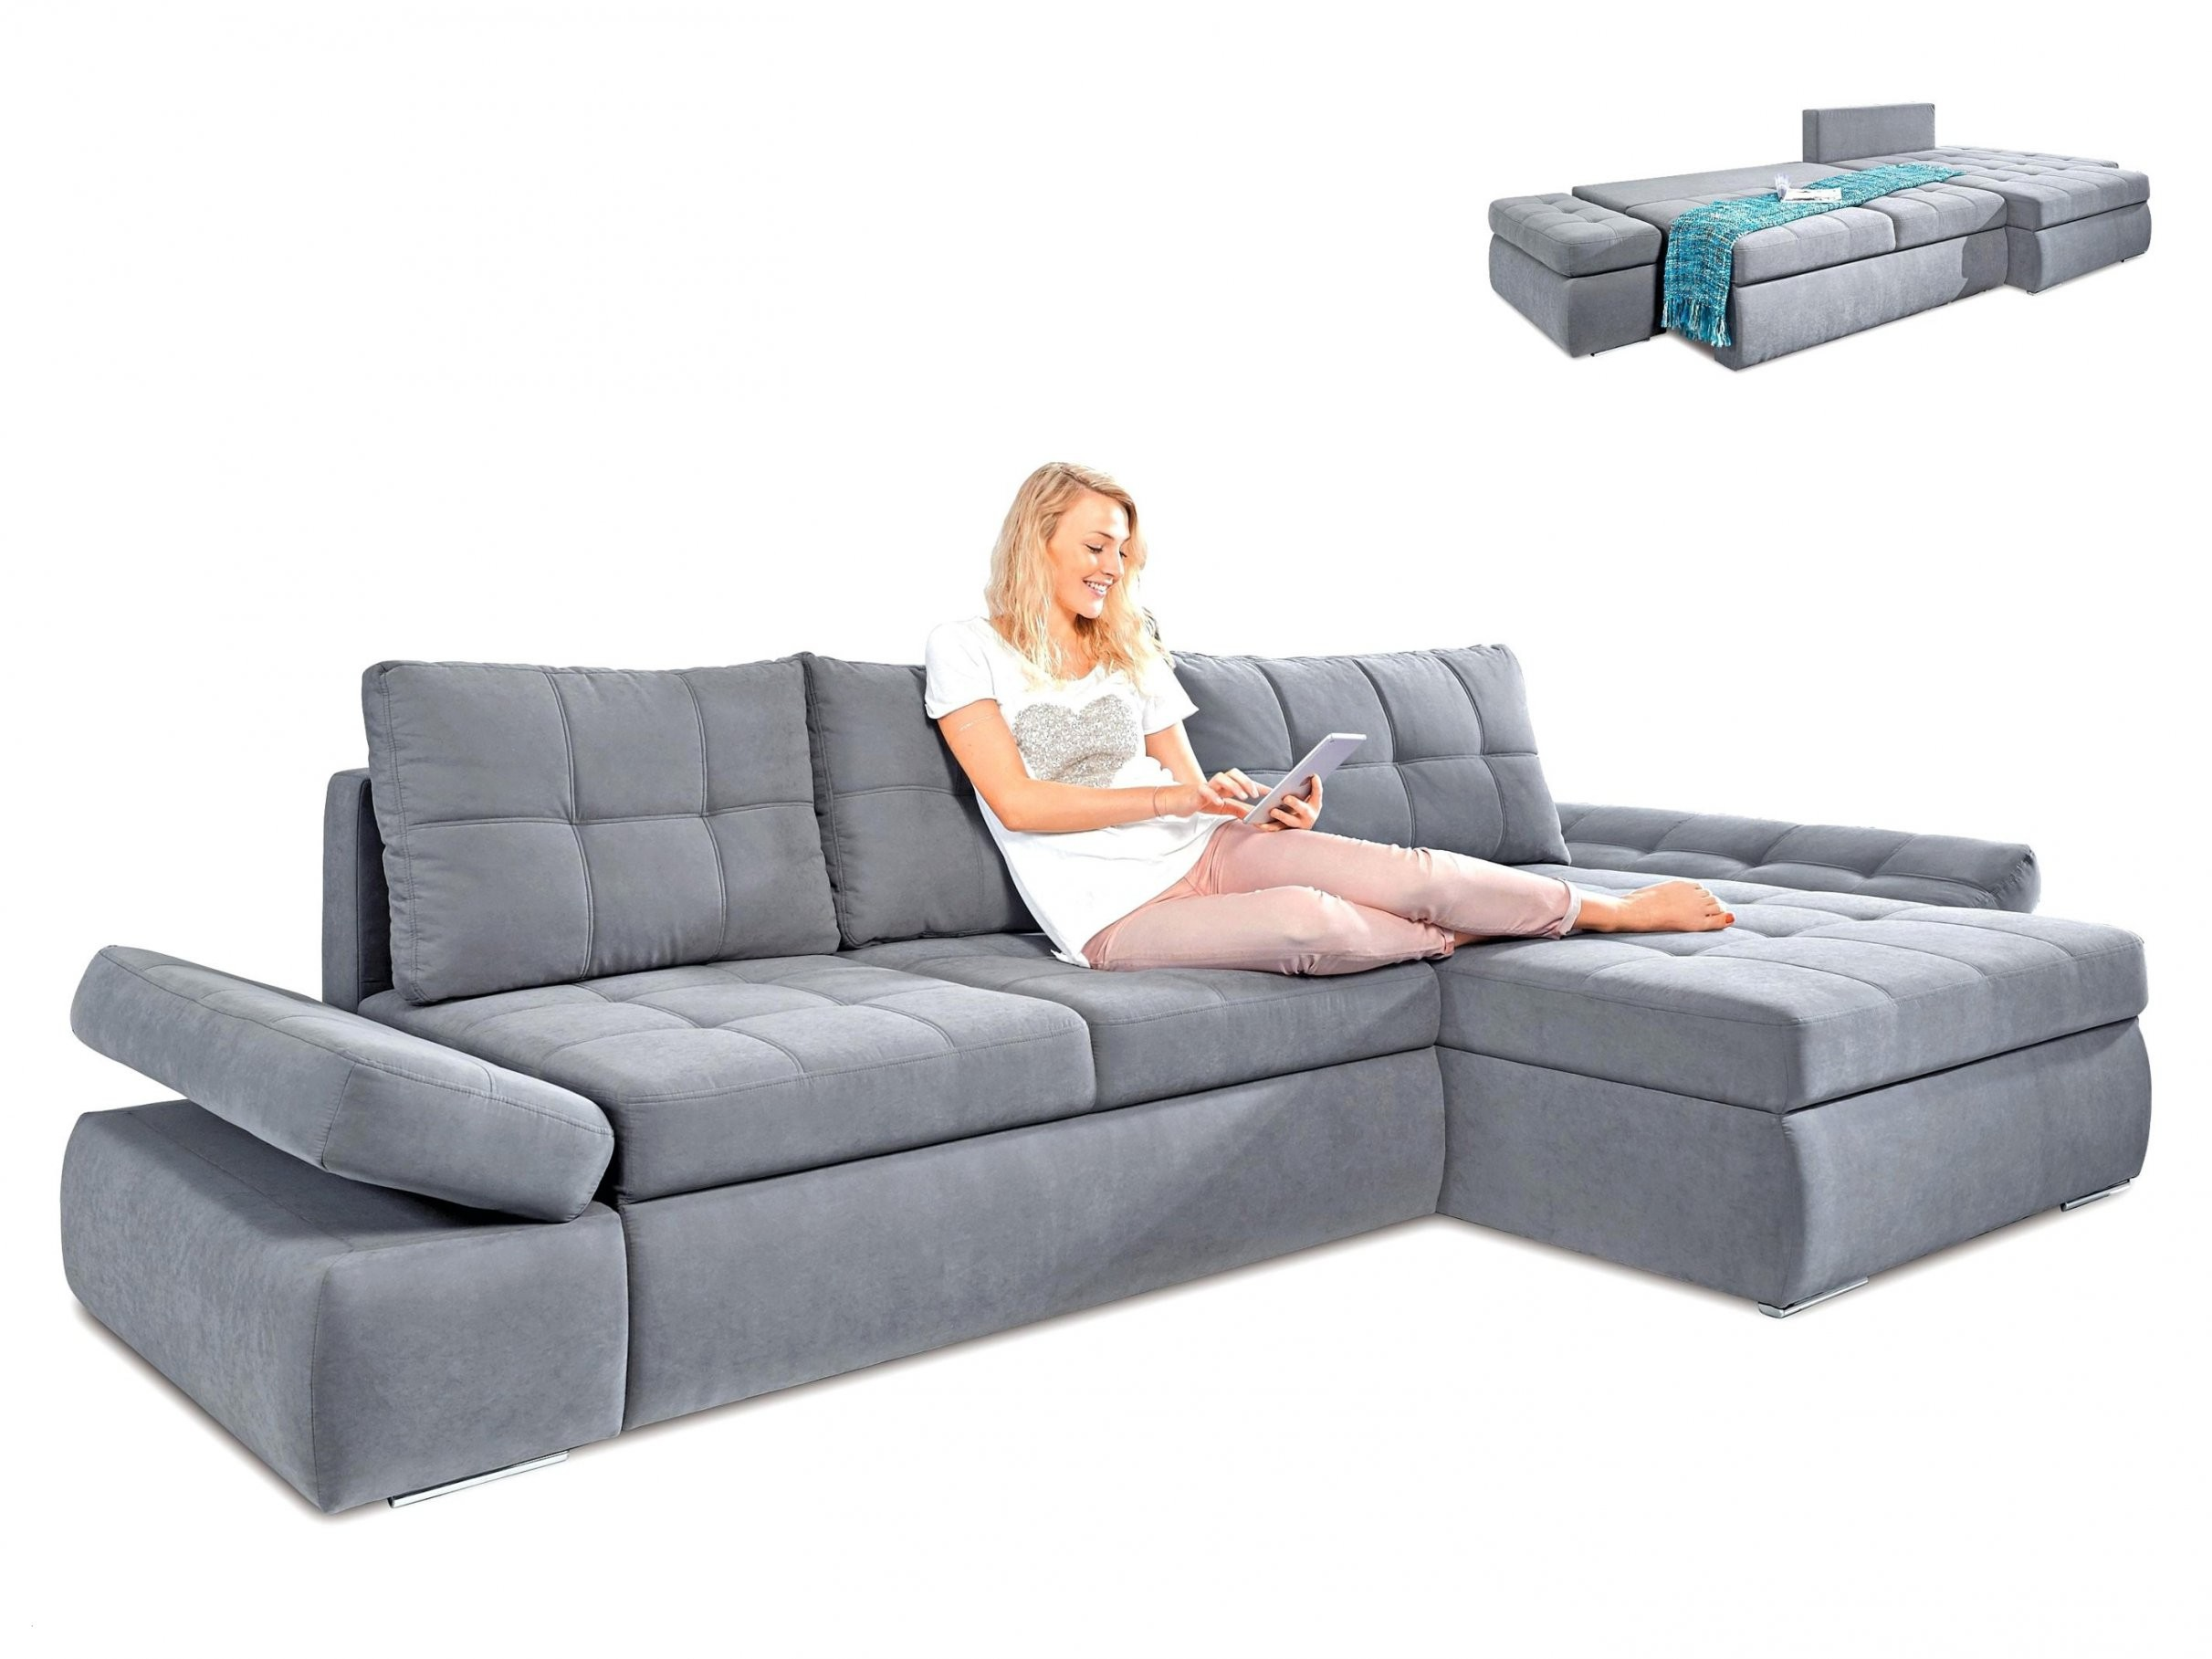 2Er Sofa Mit Recamiere Elegant 2 Sitzer Sofa Mit Recamiere von 2 Sitzer Sofa Mit Recamiere Photo